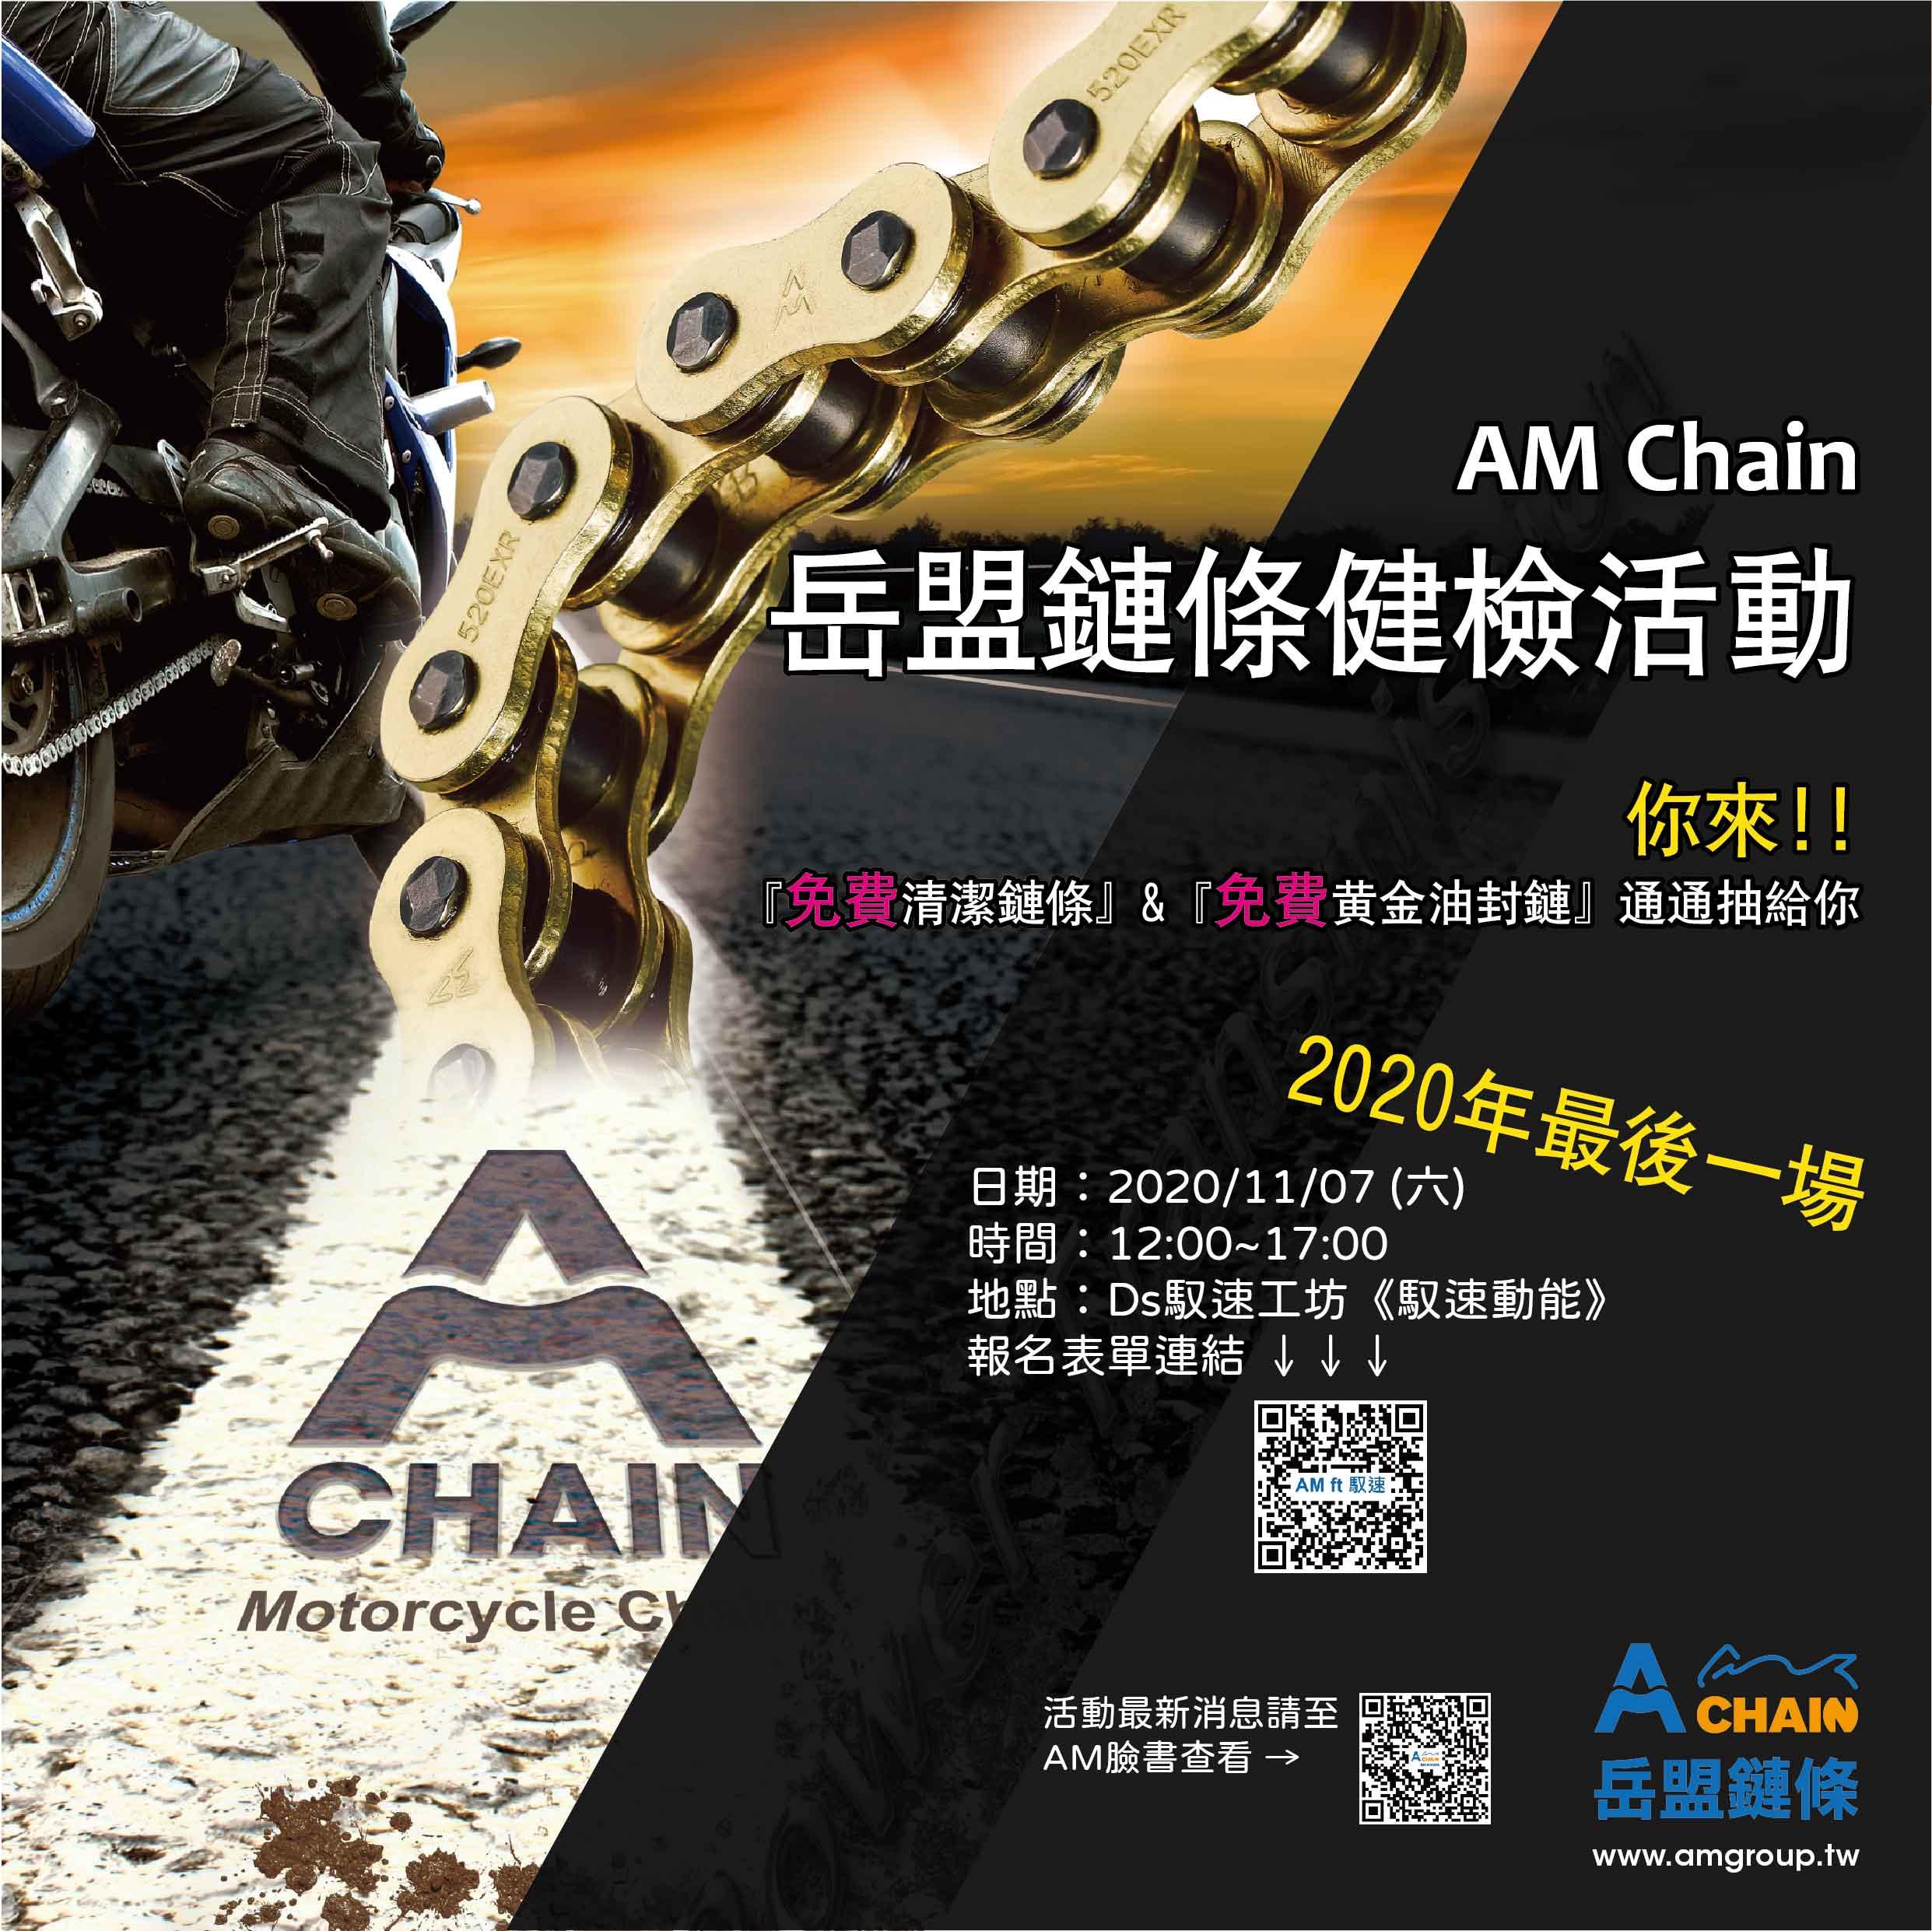 proimages/news/20200528_ChainCheck/2020鏈條健檢活動網路宣傳-官網2.jpg